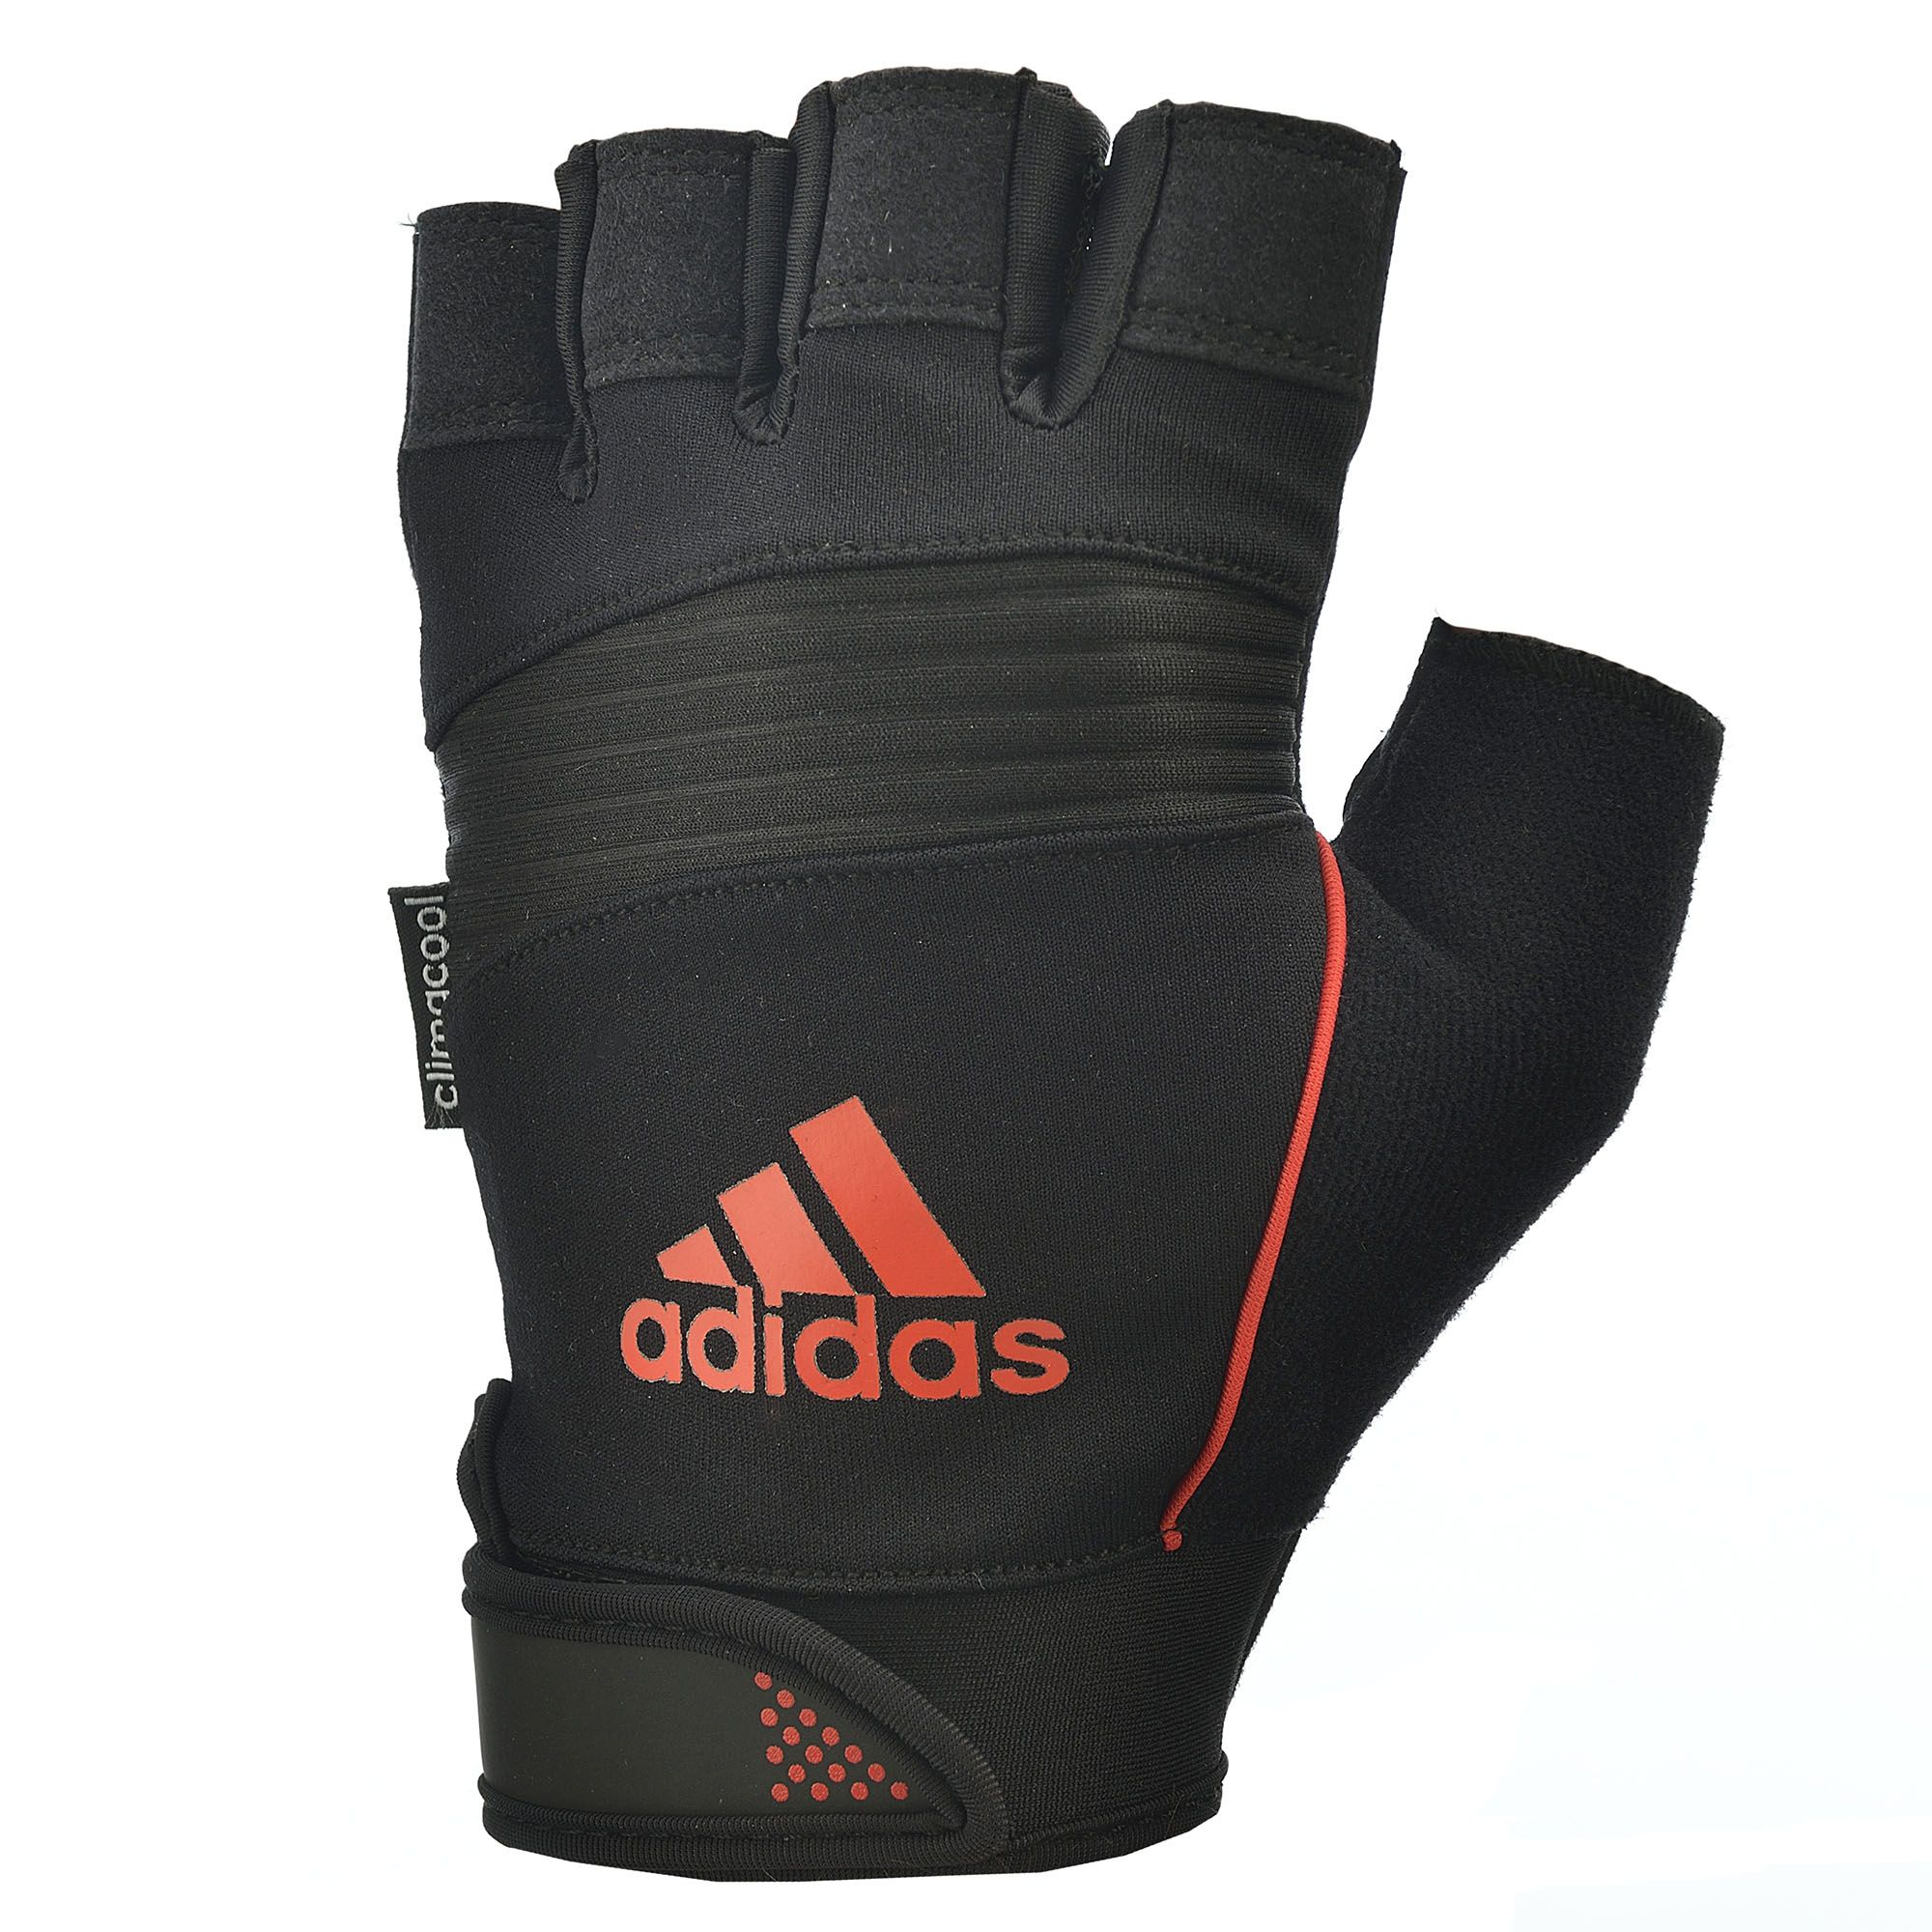 adidas performance fingerless weight lifting gloves sweatbandcom